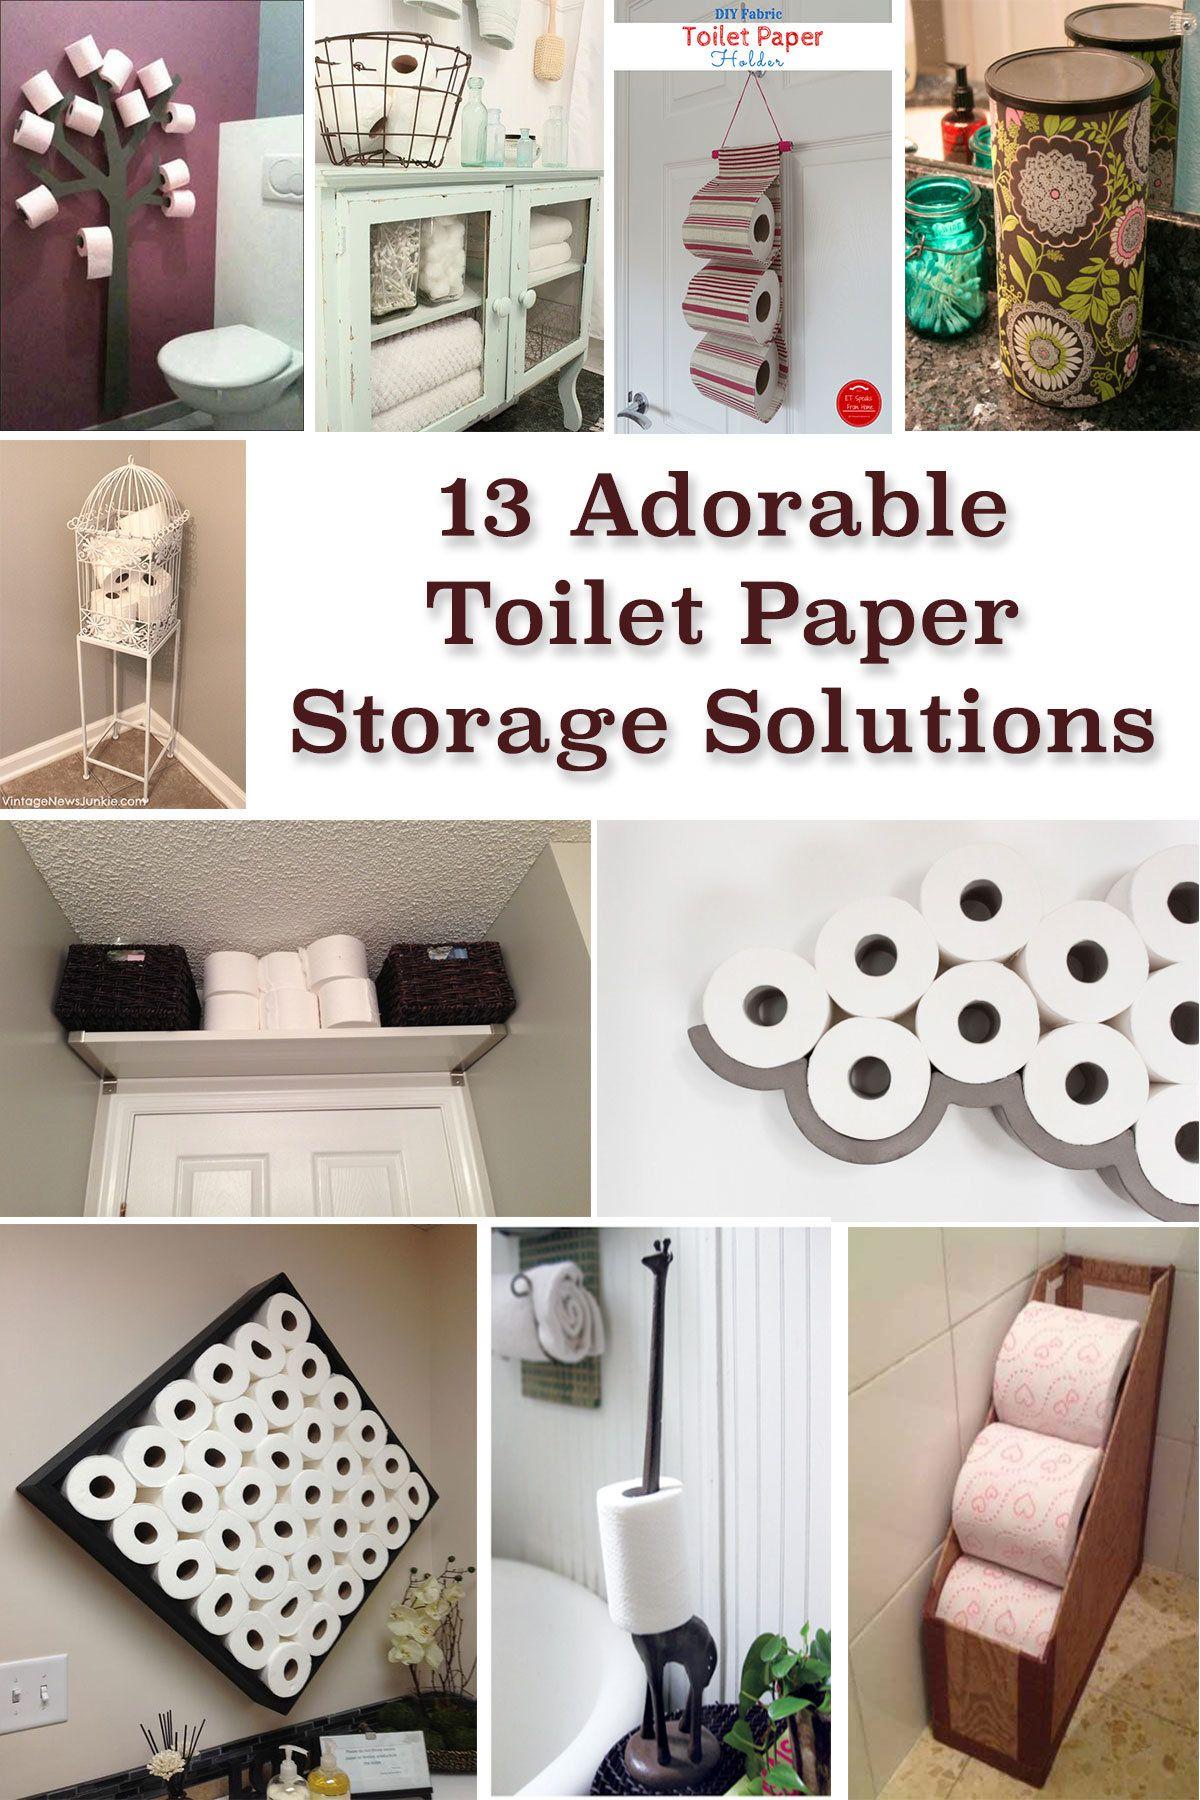 13 Adorable Toilet Paper Storage Solutions Toilet Paper Storage